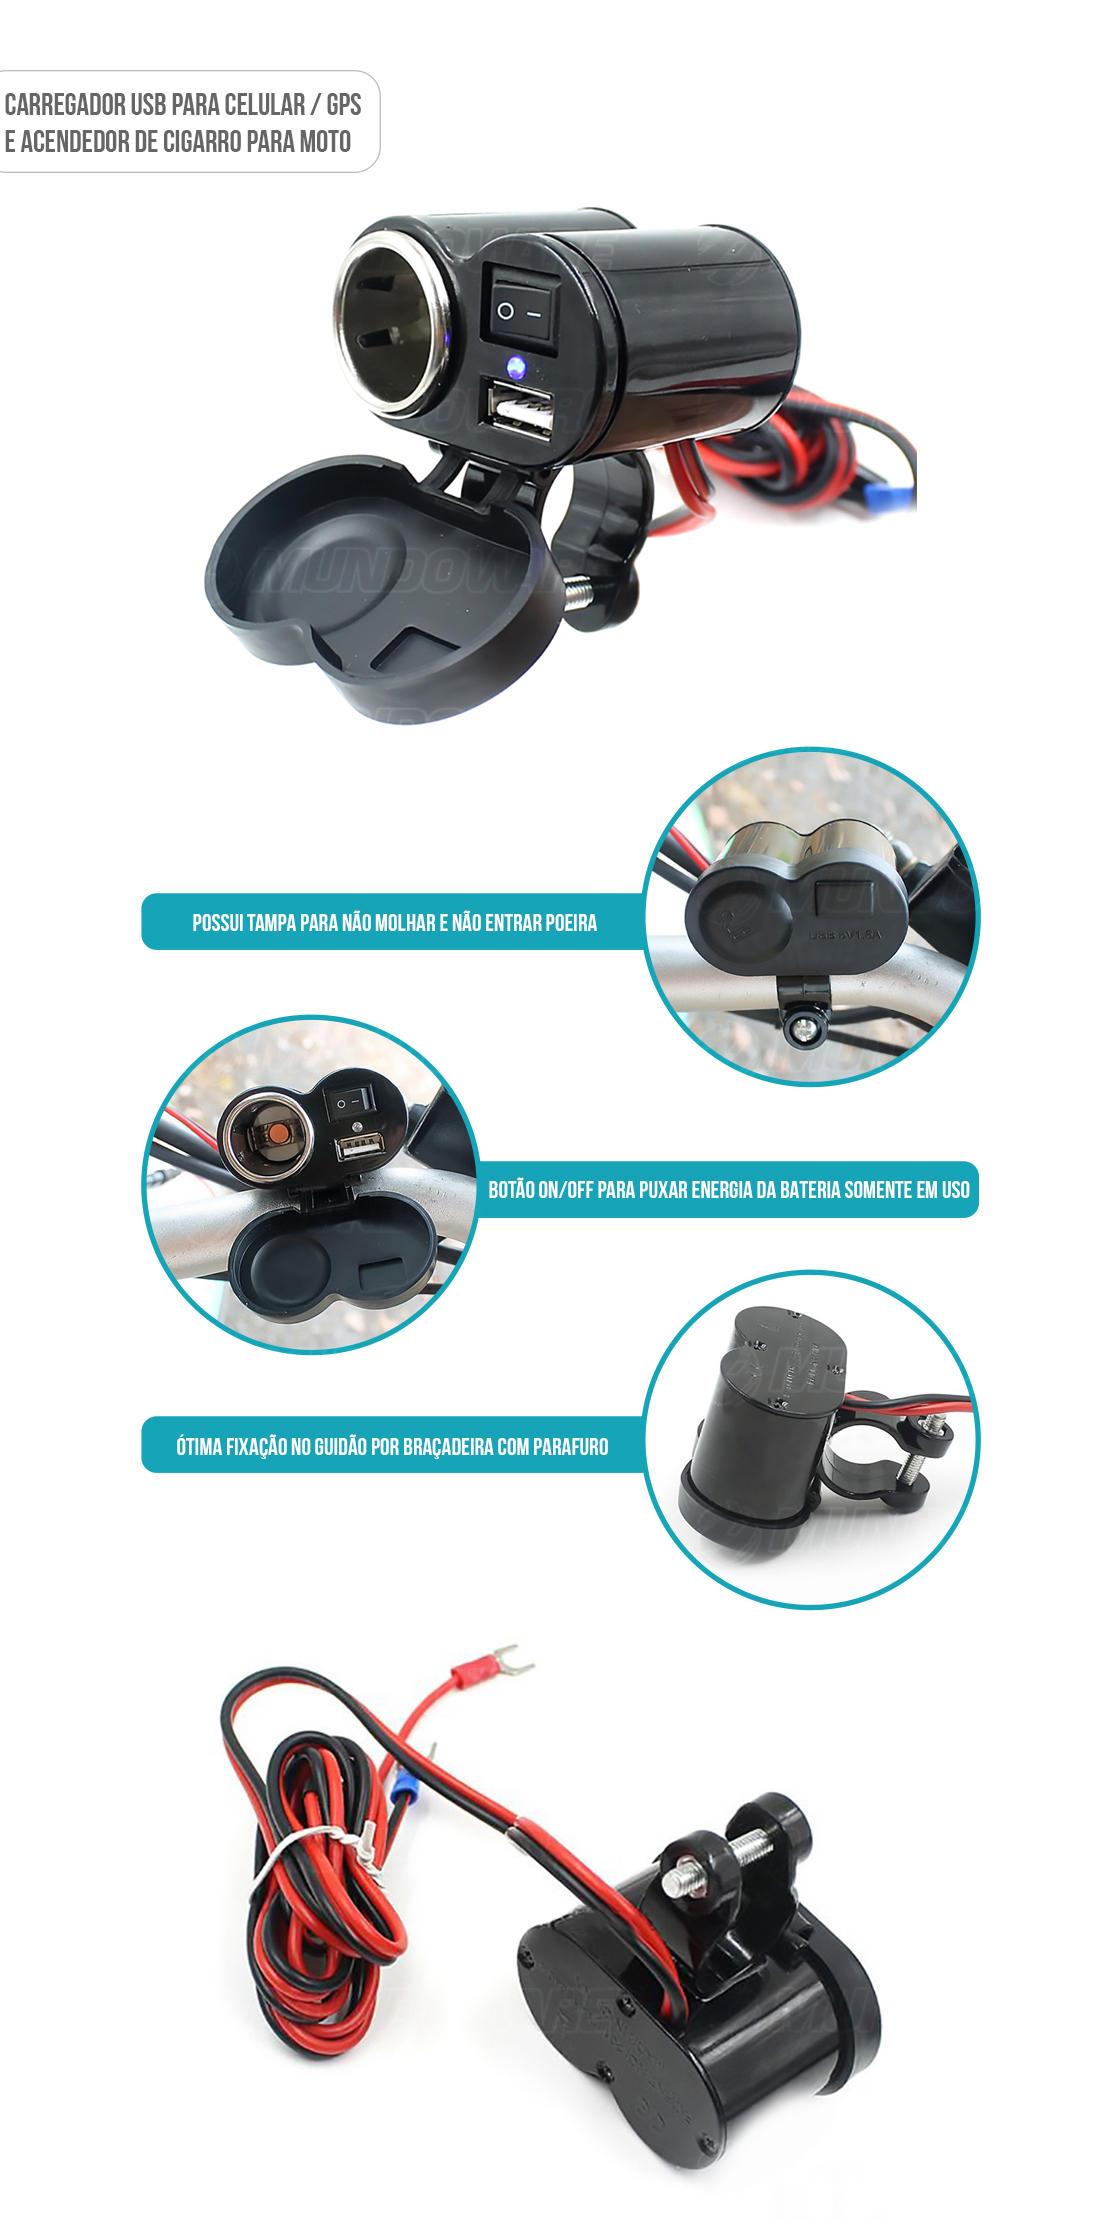 Carregador adaptador USB e acendedor de cigarro para Motocicleta